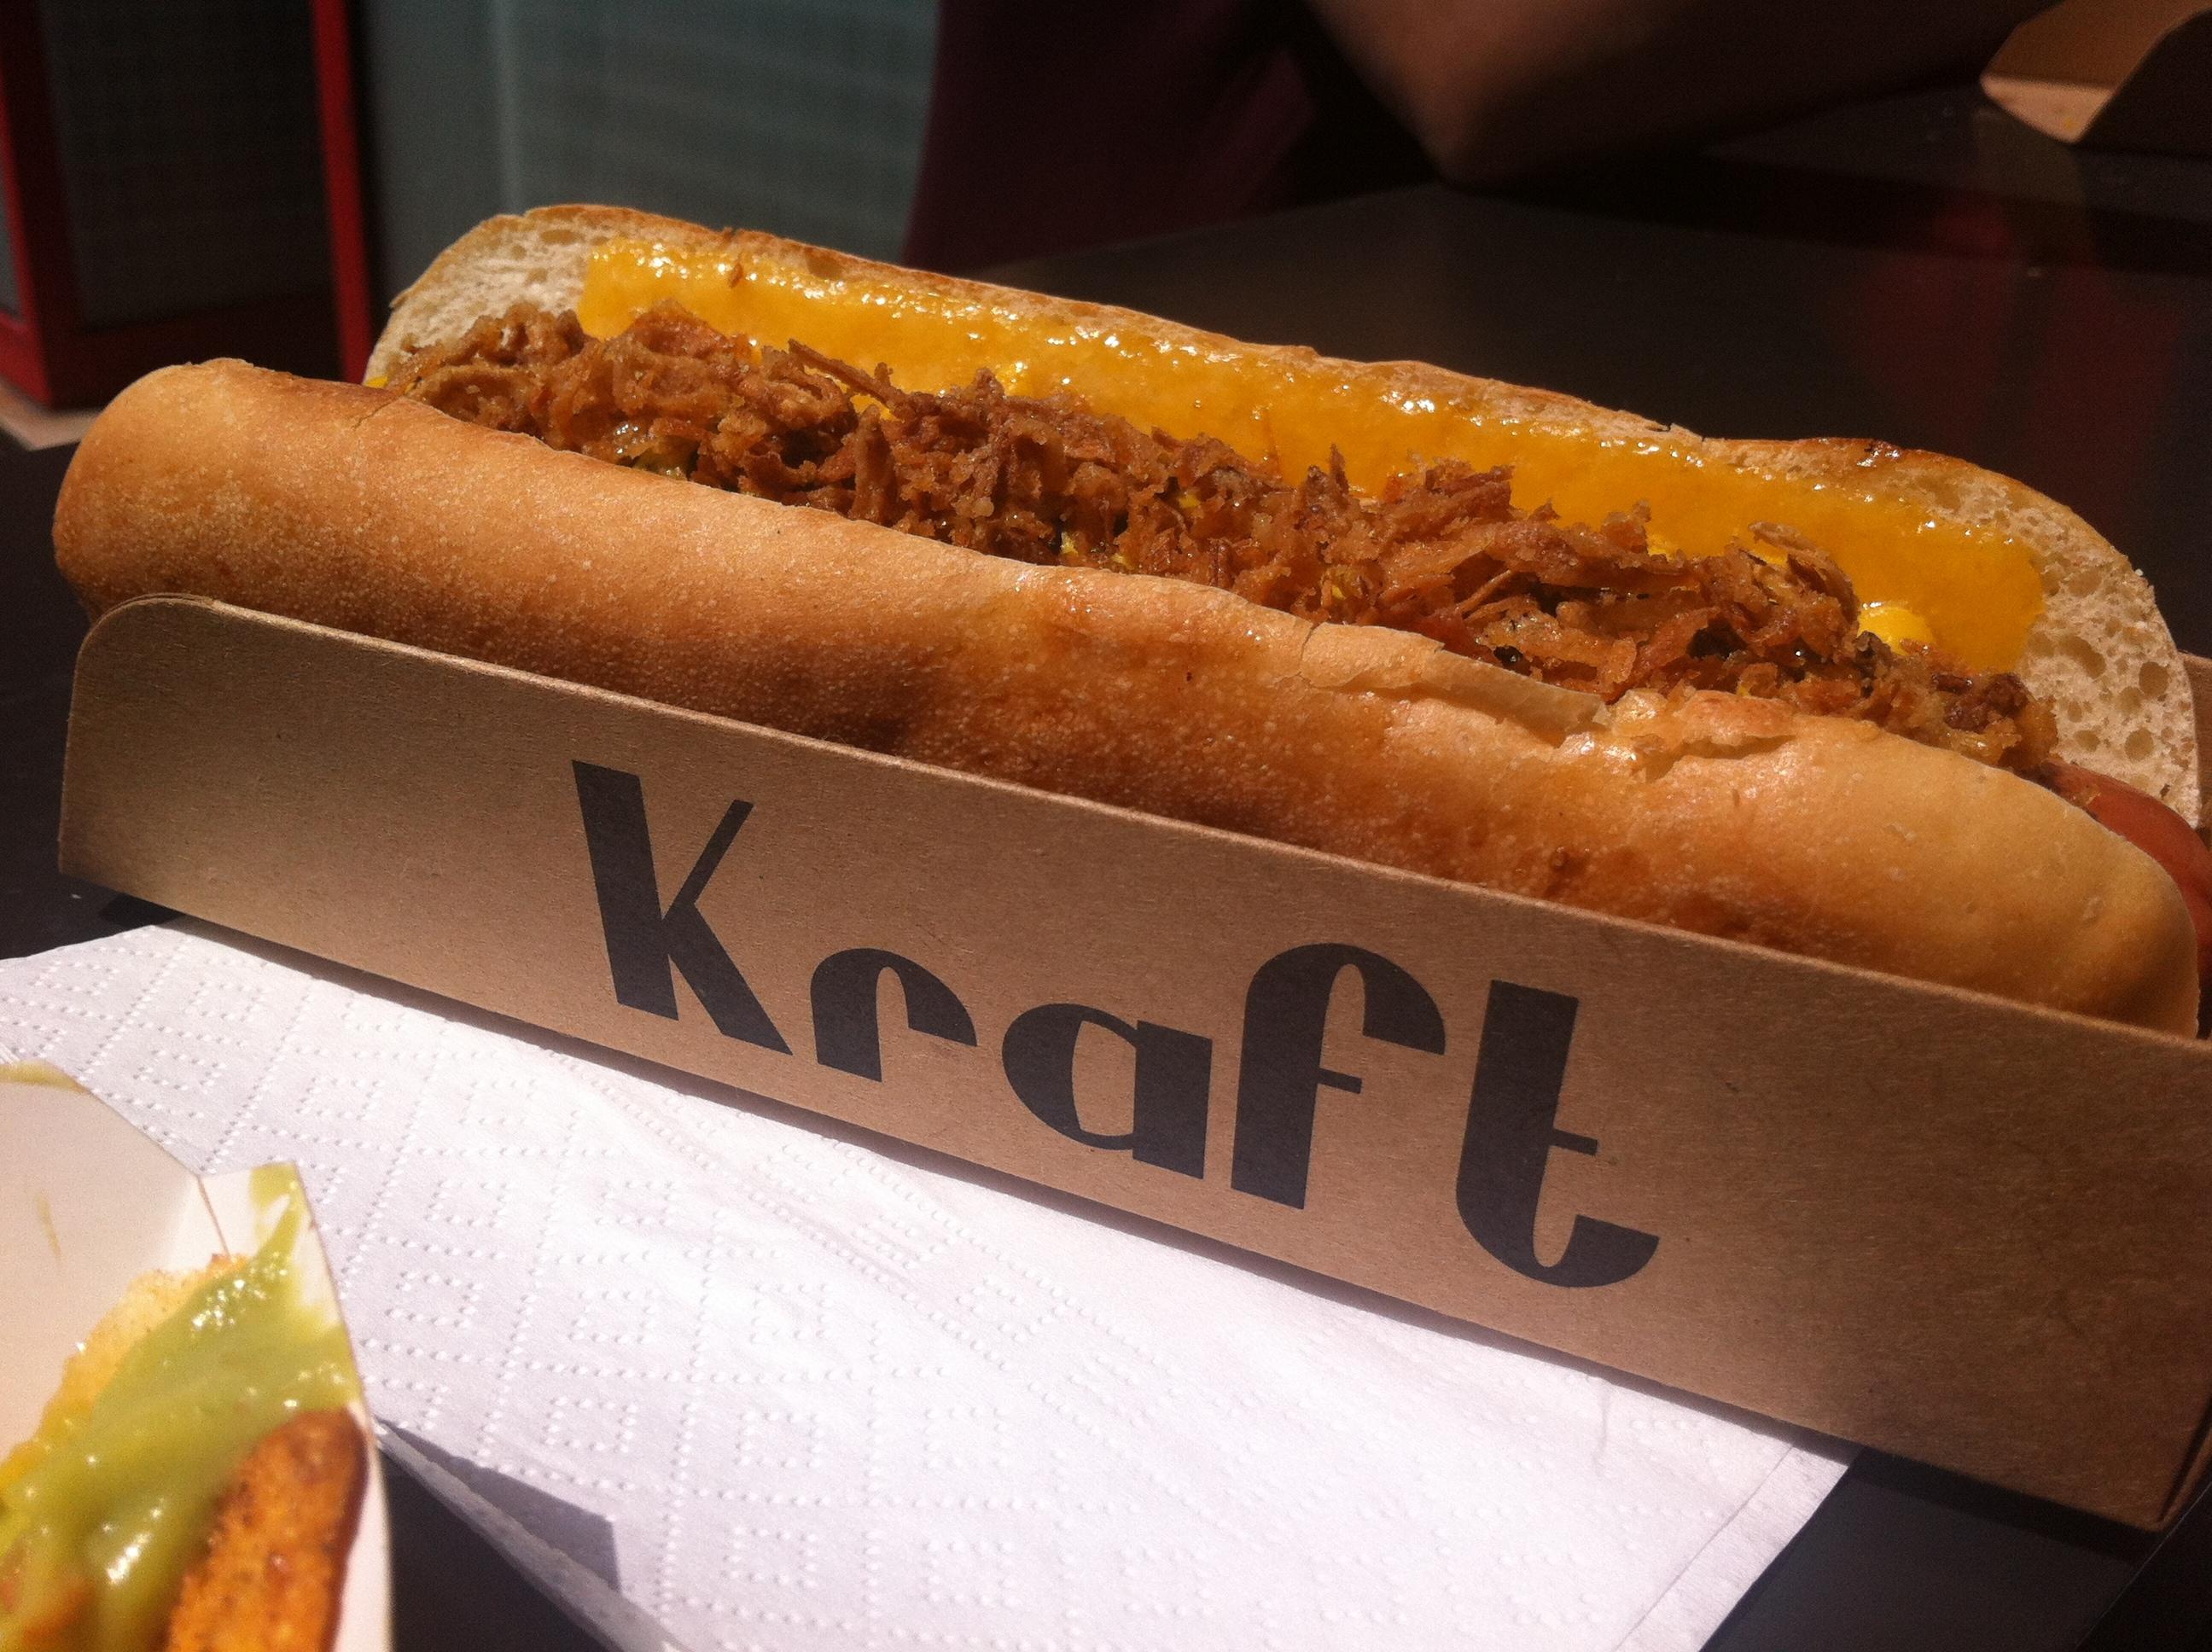 Kraft hot-dog